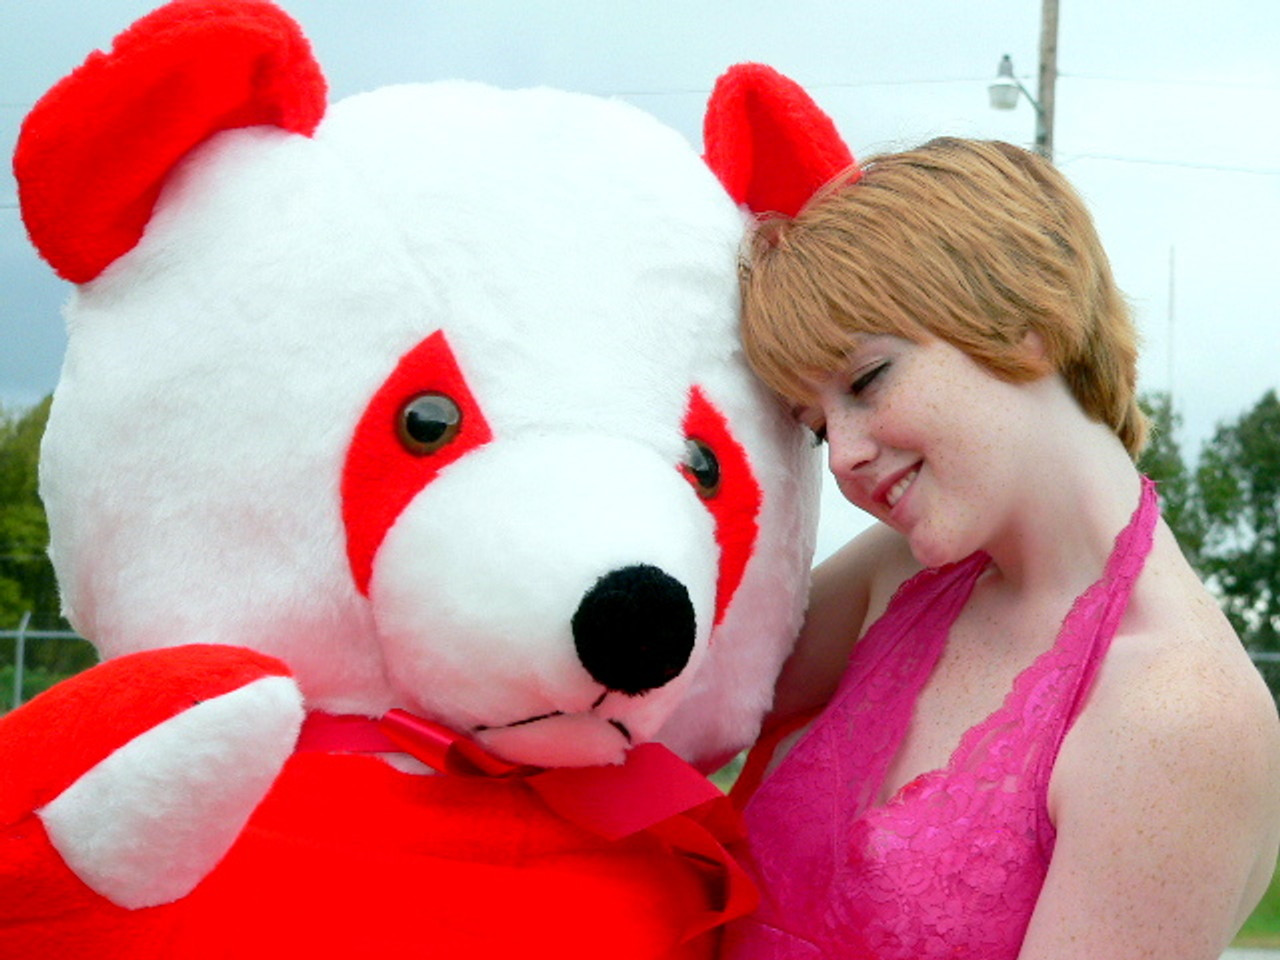 American Made 6 Foot Giant Stuffed Red Panda 72 Inch Soft Bear Made